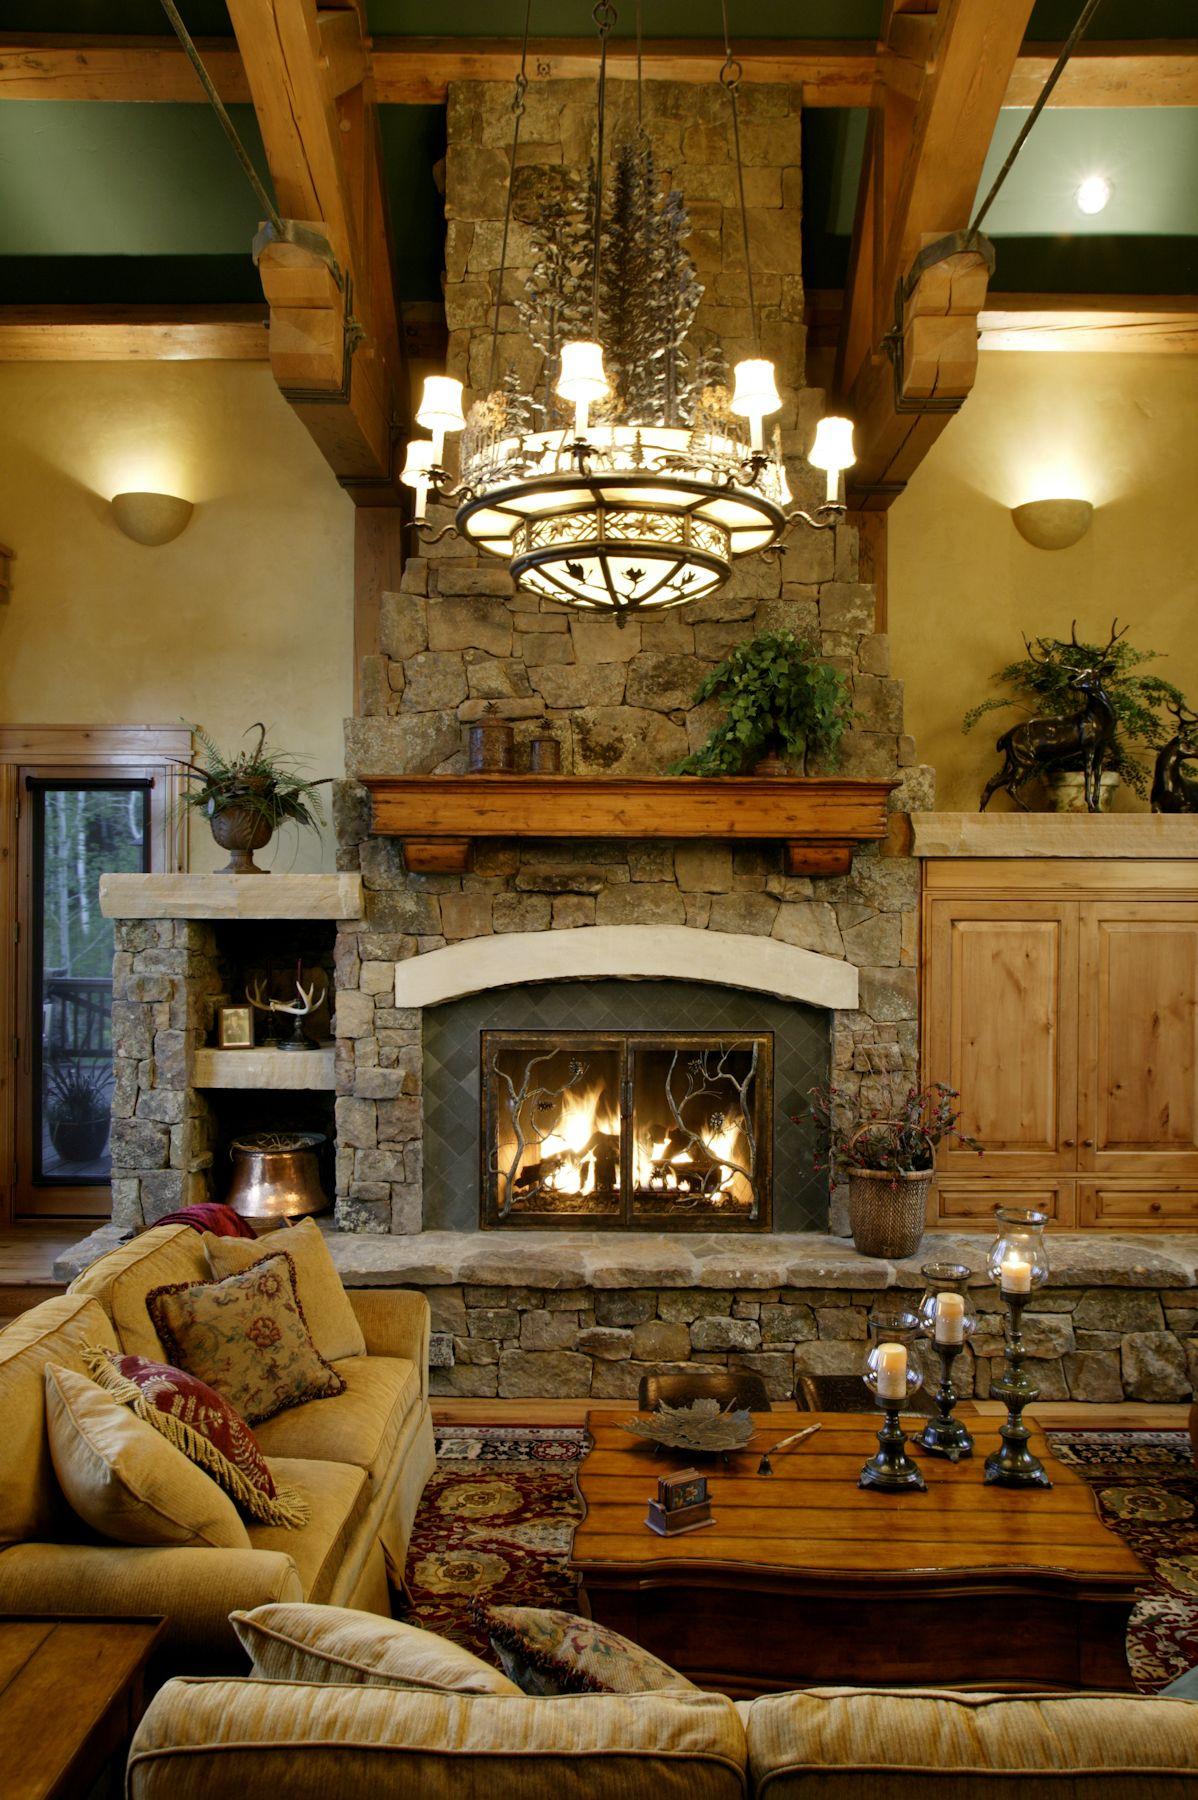 marvellous grand living room fireplace | Edgewood Custom Log Homes - Grand Fireplace | Log homes ...